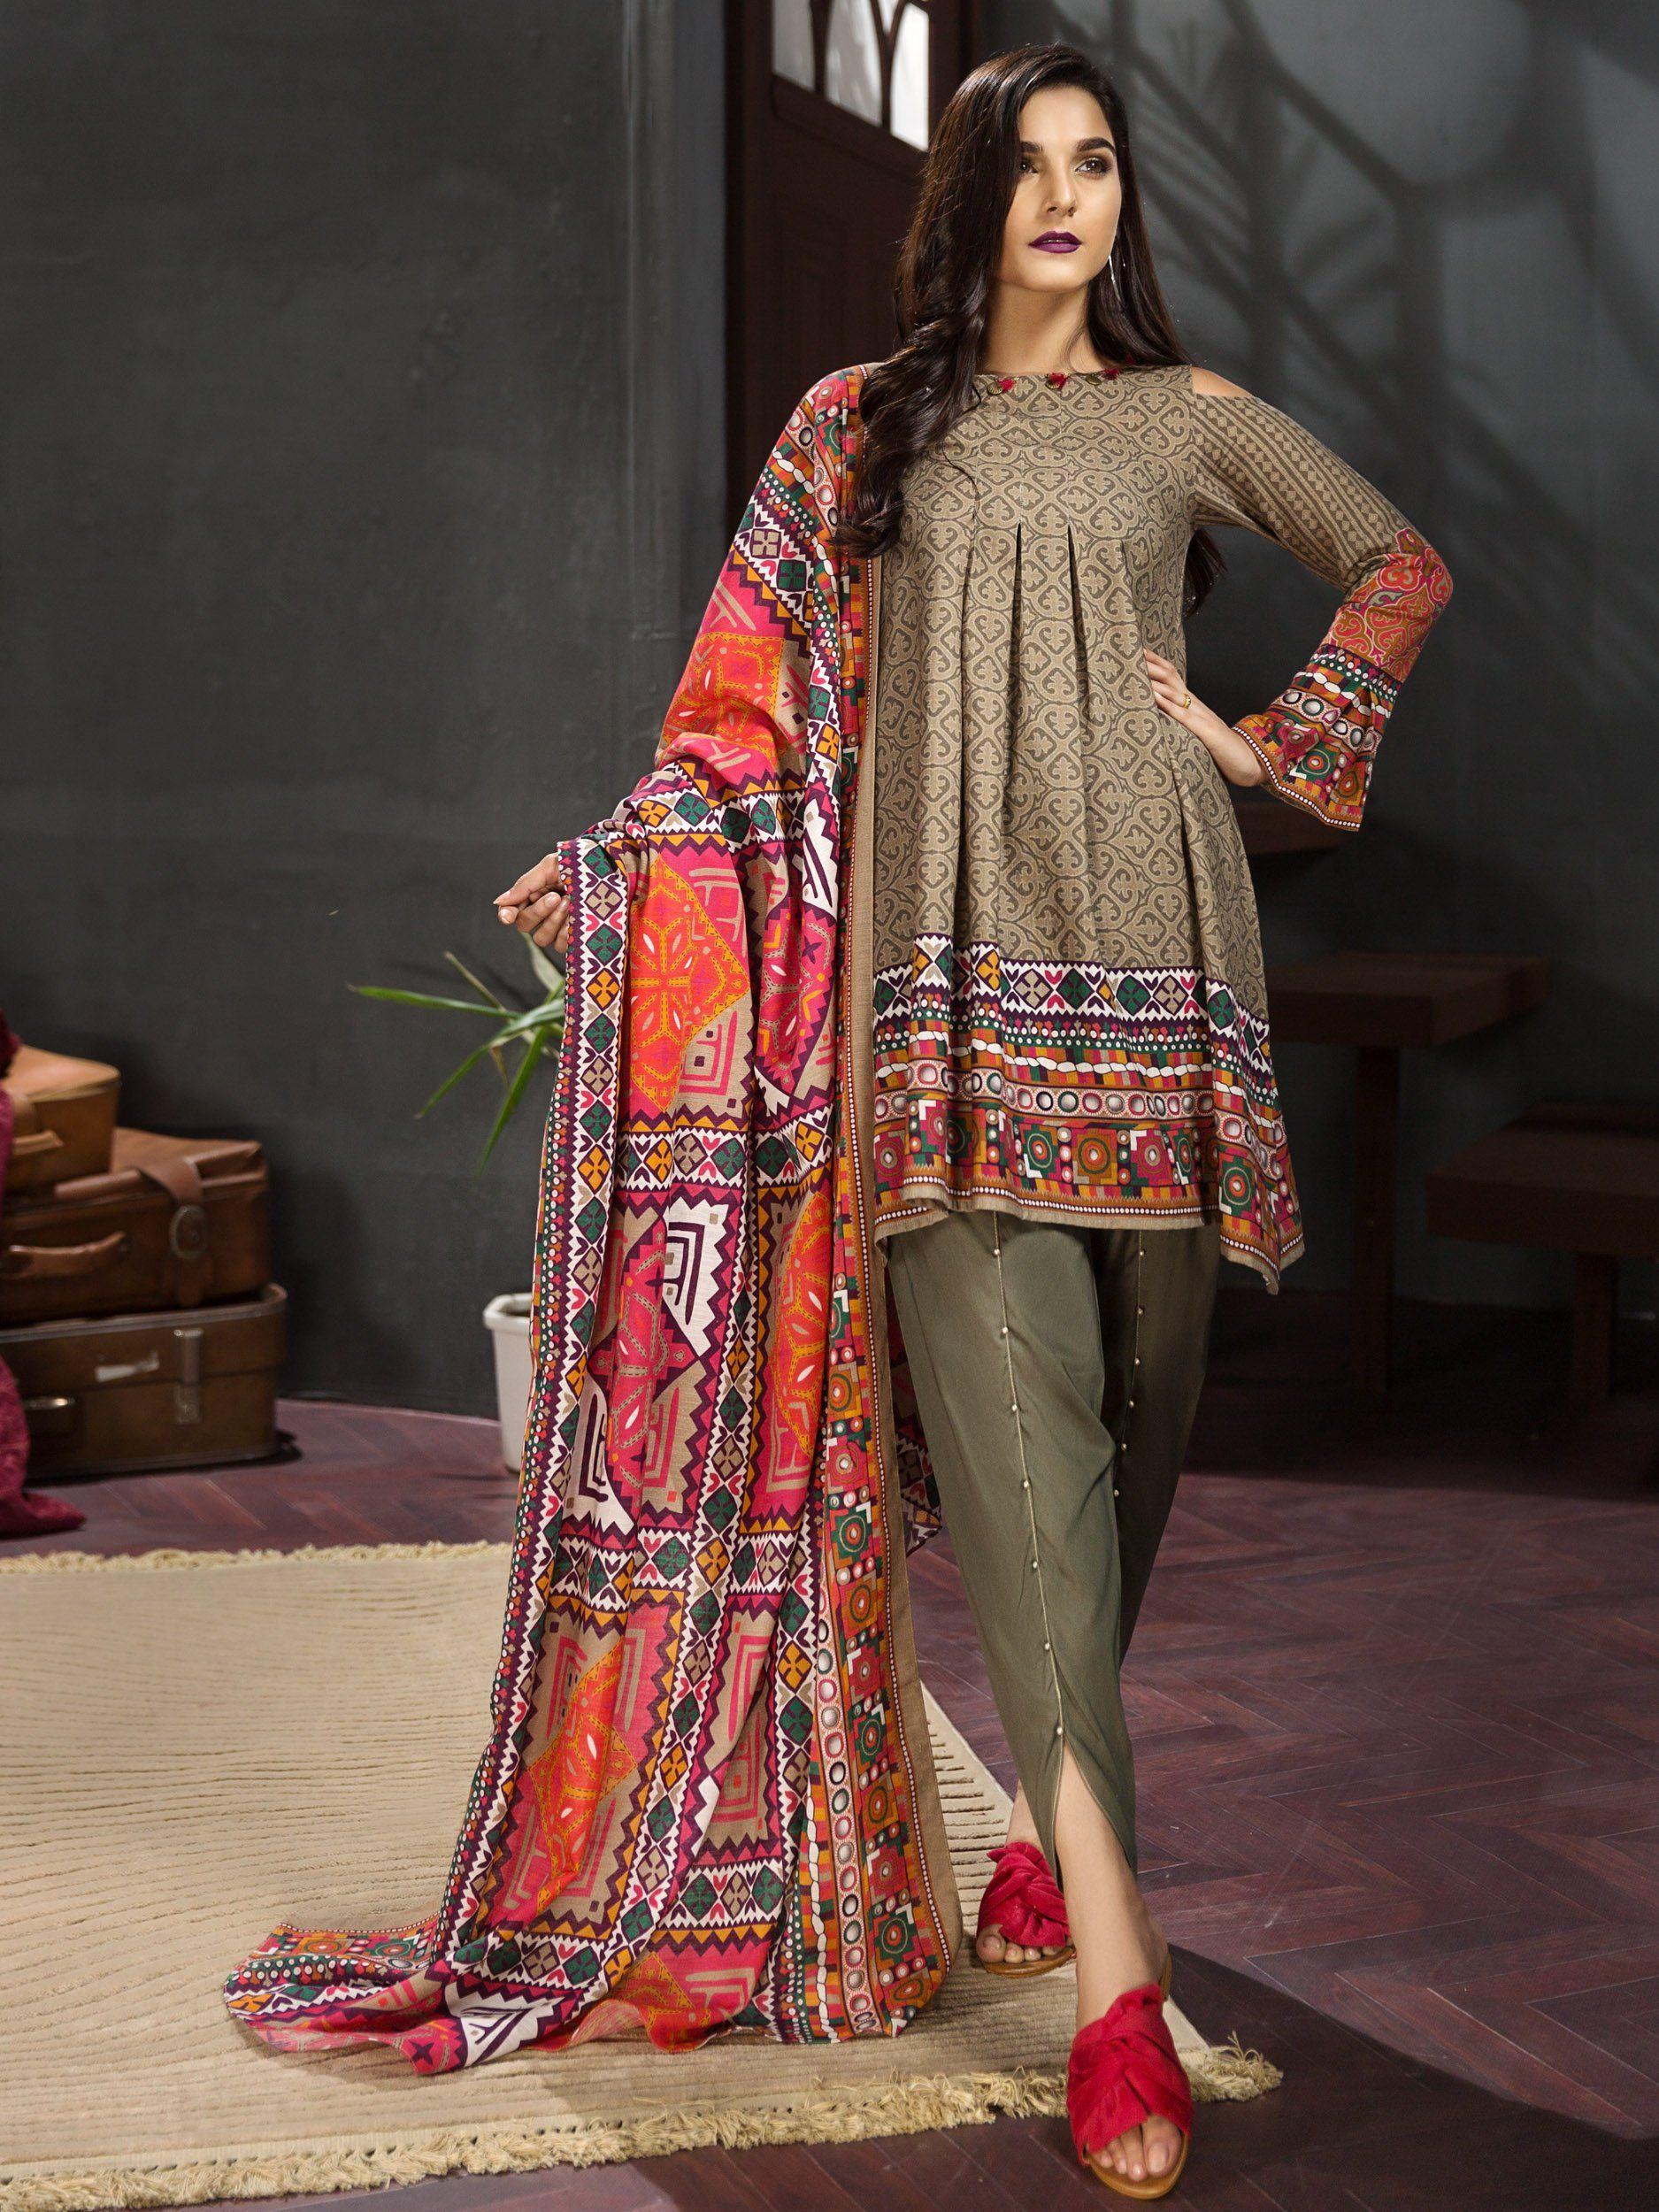 winter dresses 2018 2019 ethnic attire suit khaddar. Black Bedroom Furniture Sets. Home Design Ideas